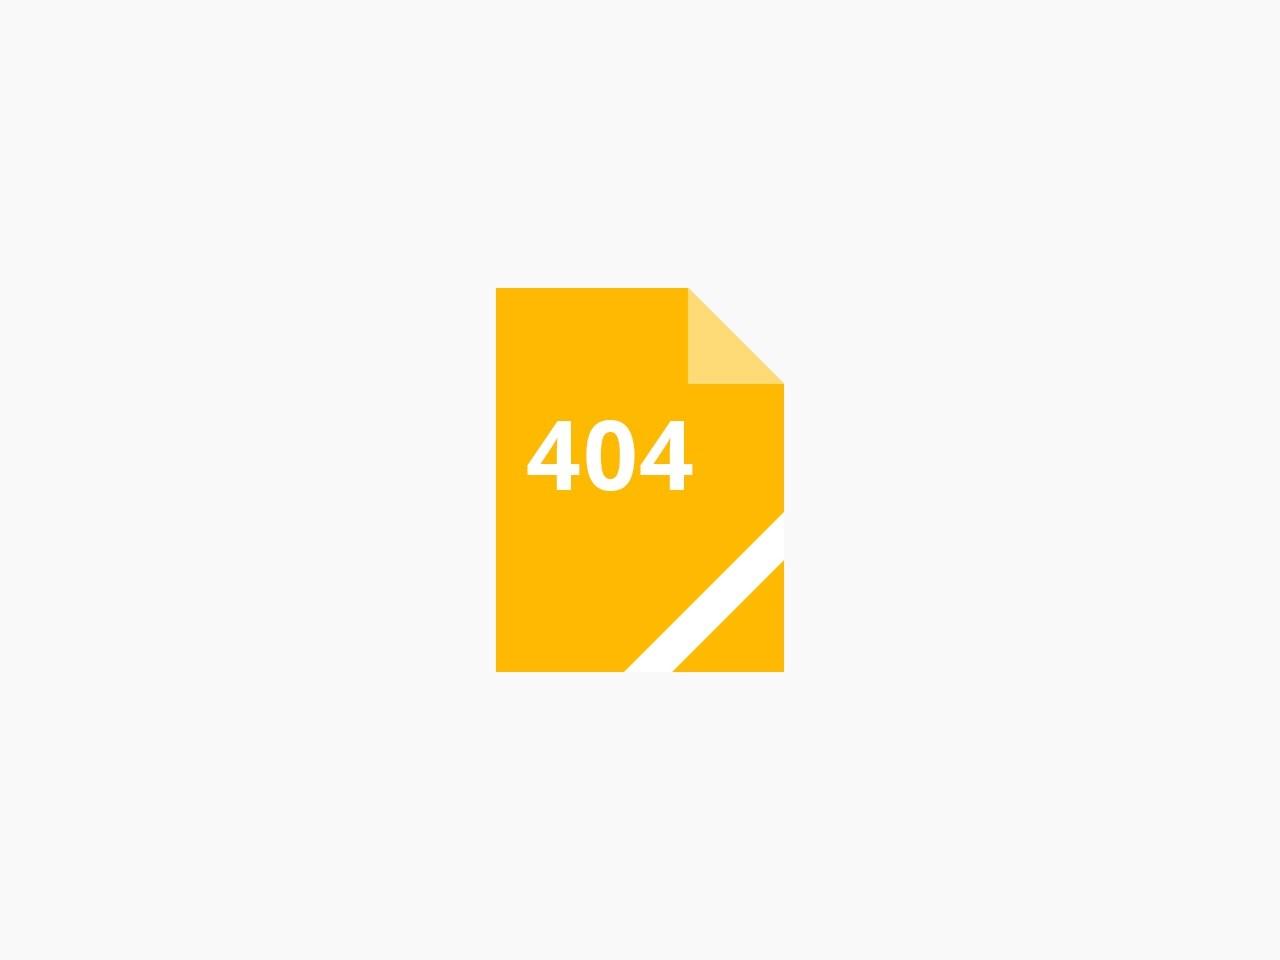 美術品買取市場|絵画・美術品高価買取なら福岡の美術品買取市場